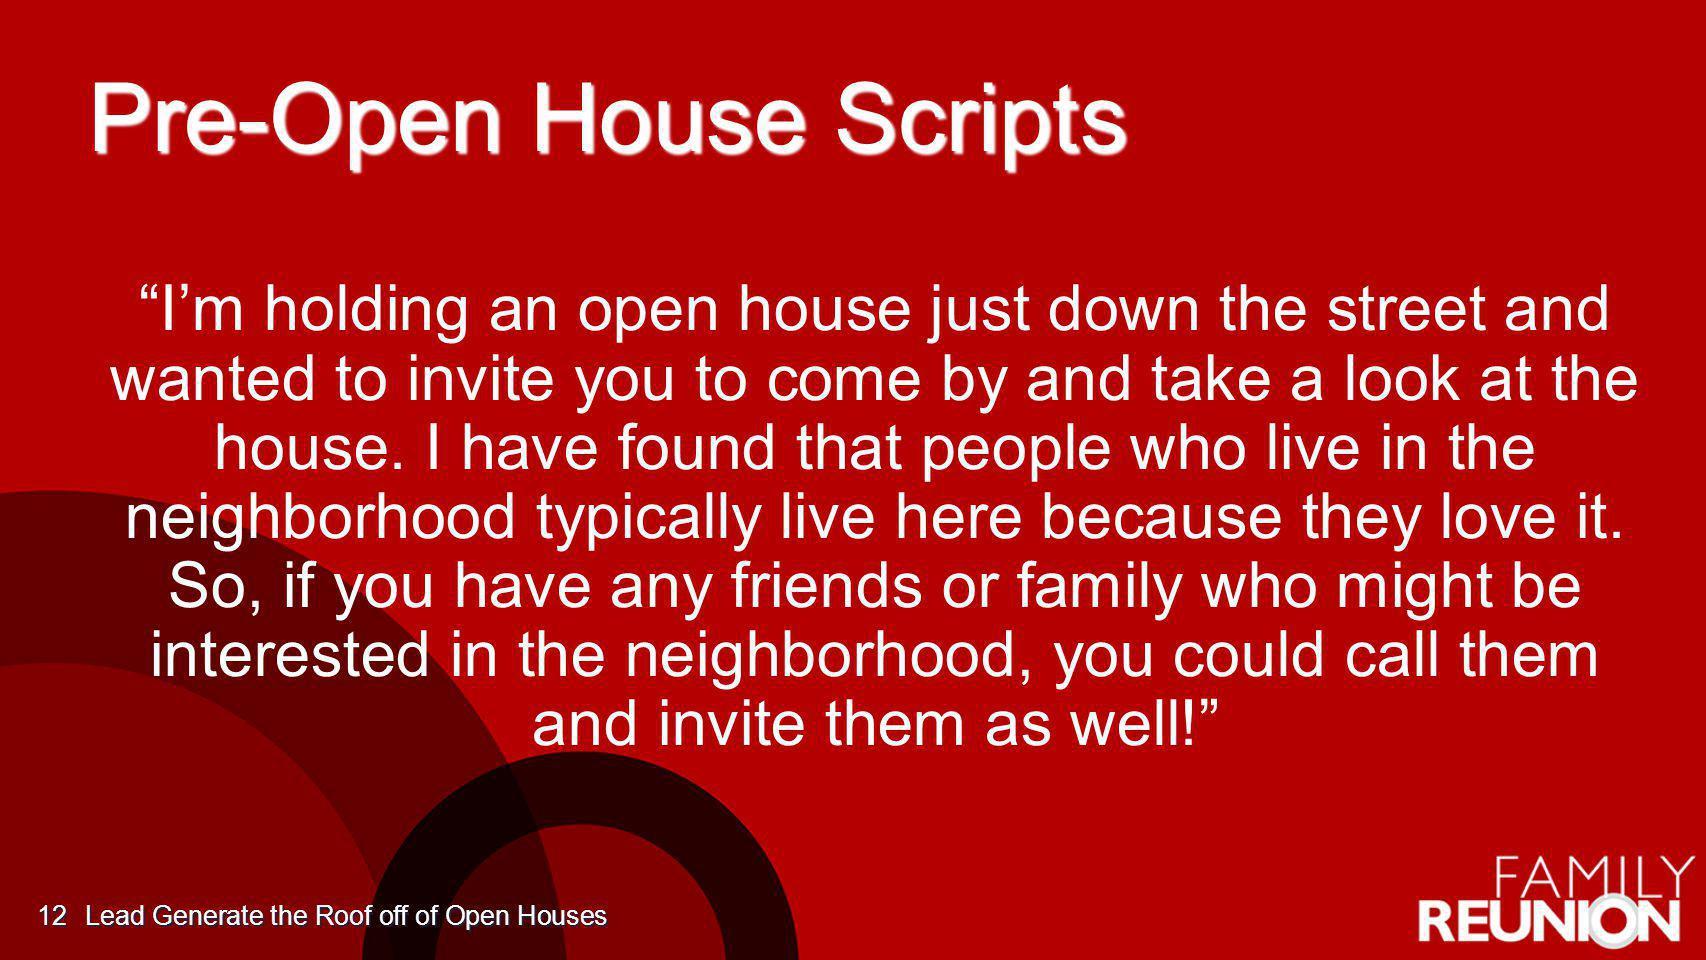 Pre-Open House Scripts